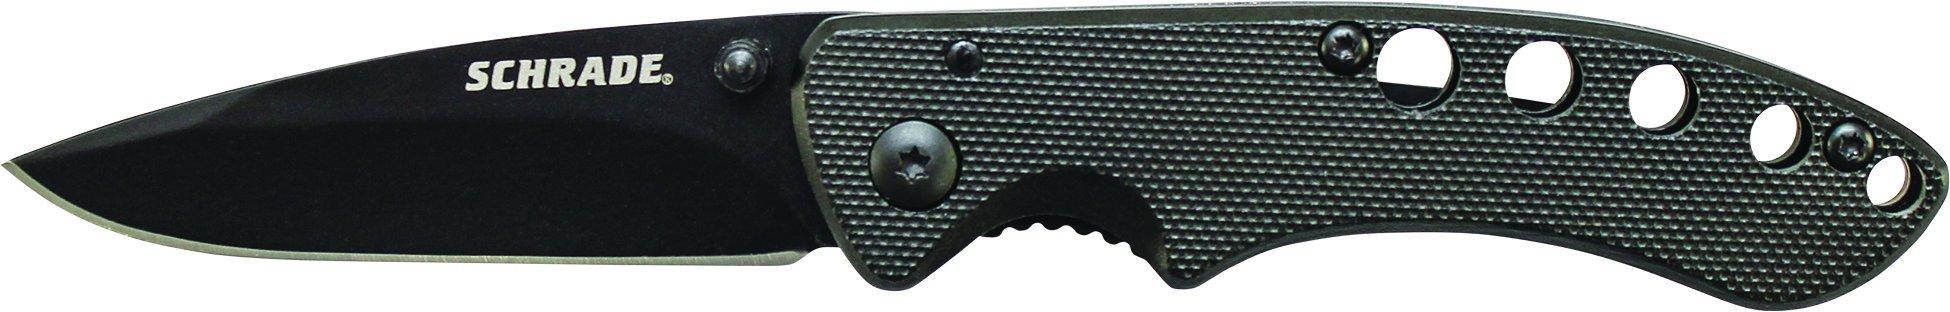 Schrade SCH107ALBK Liner Lock Folding Knife Drop Point Blade Black Aluminum Handle by Schrade (Image #2)